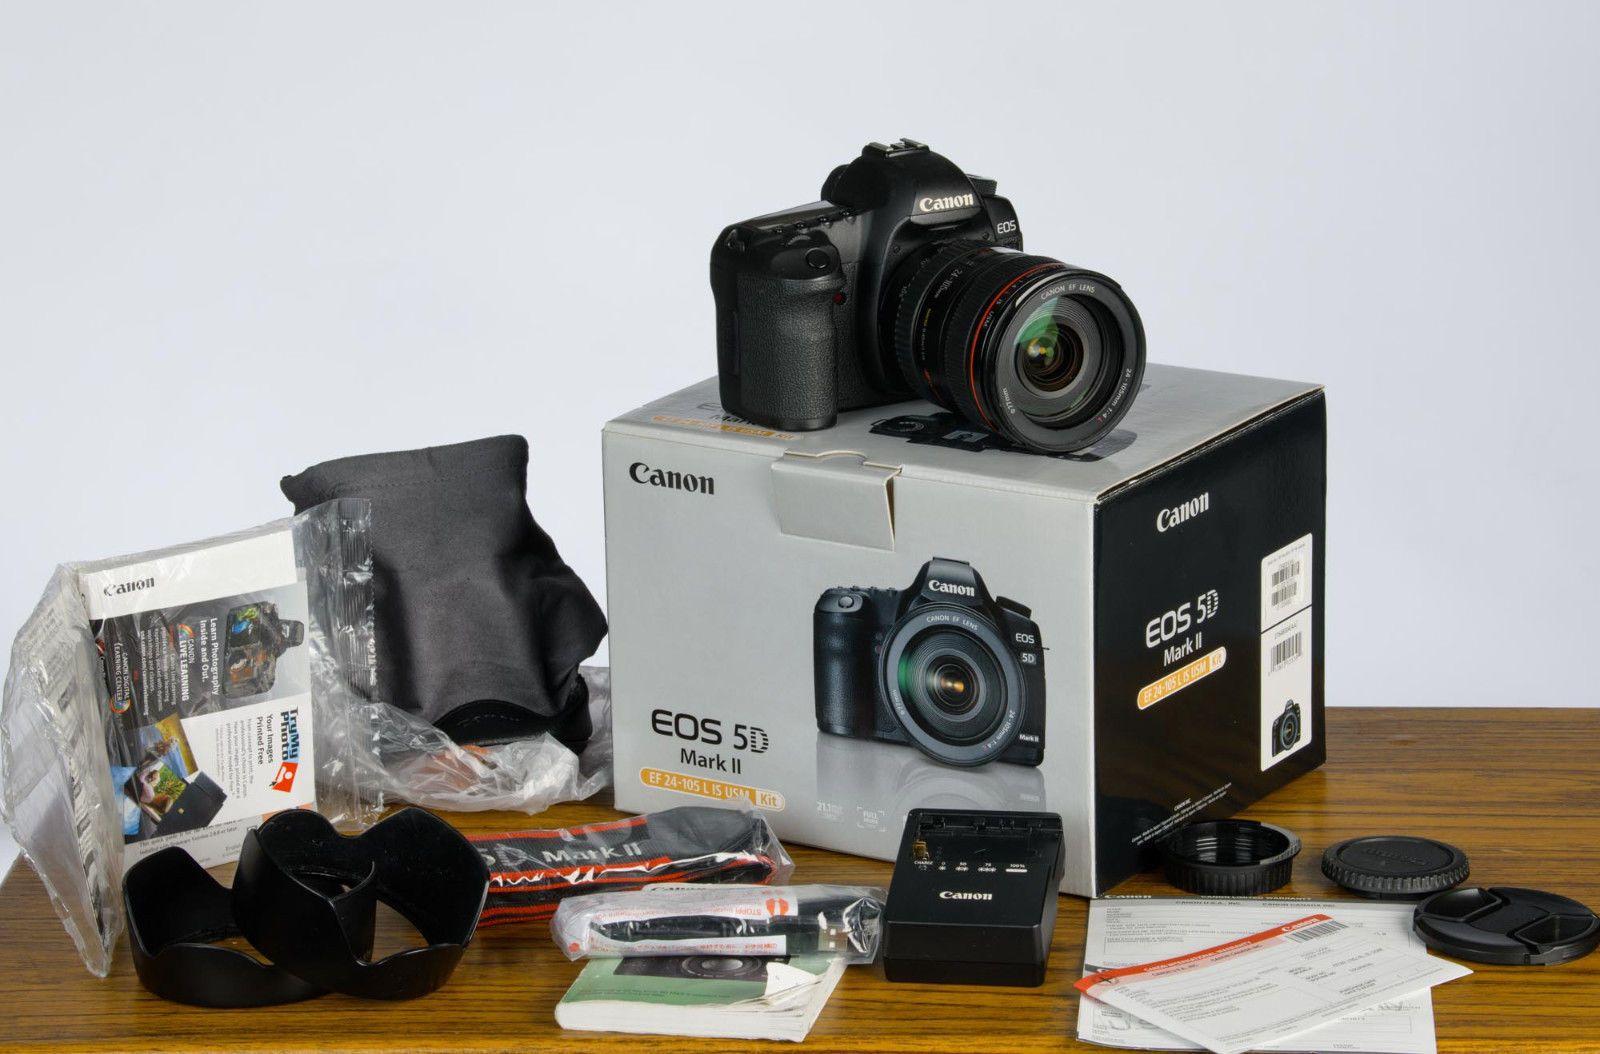 Canon 5d Mark Ii Full Frame Digital Slr Camera W Ef 24 105mm L Is Lens In Box Digital Slr Camera Digital Slr Digital Camera